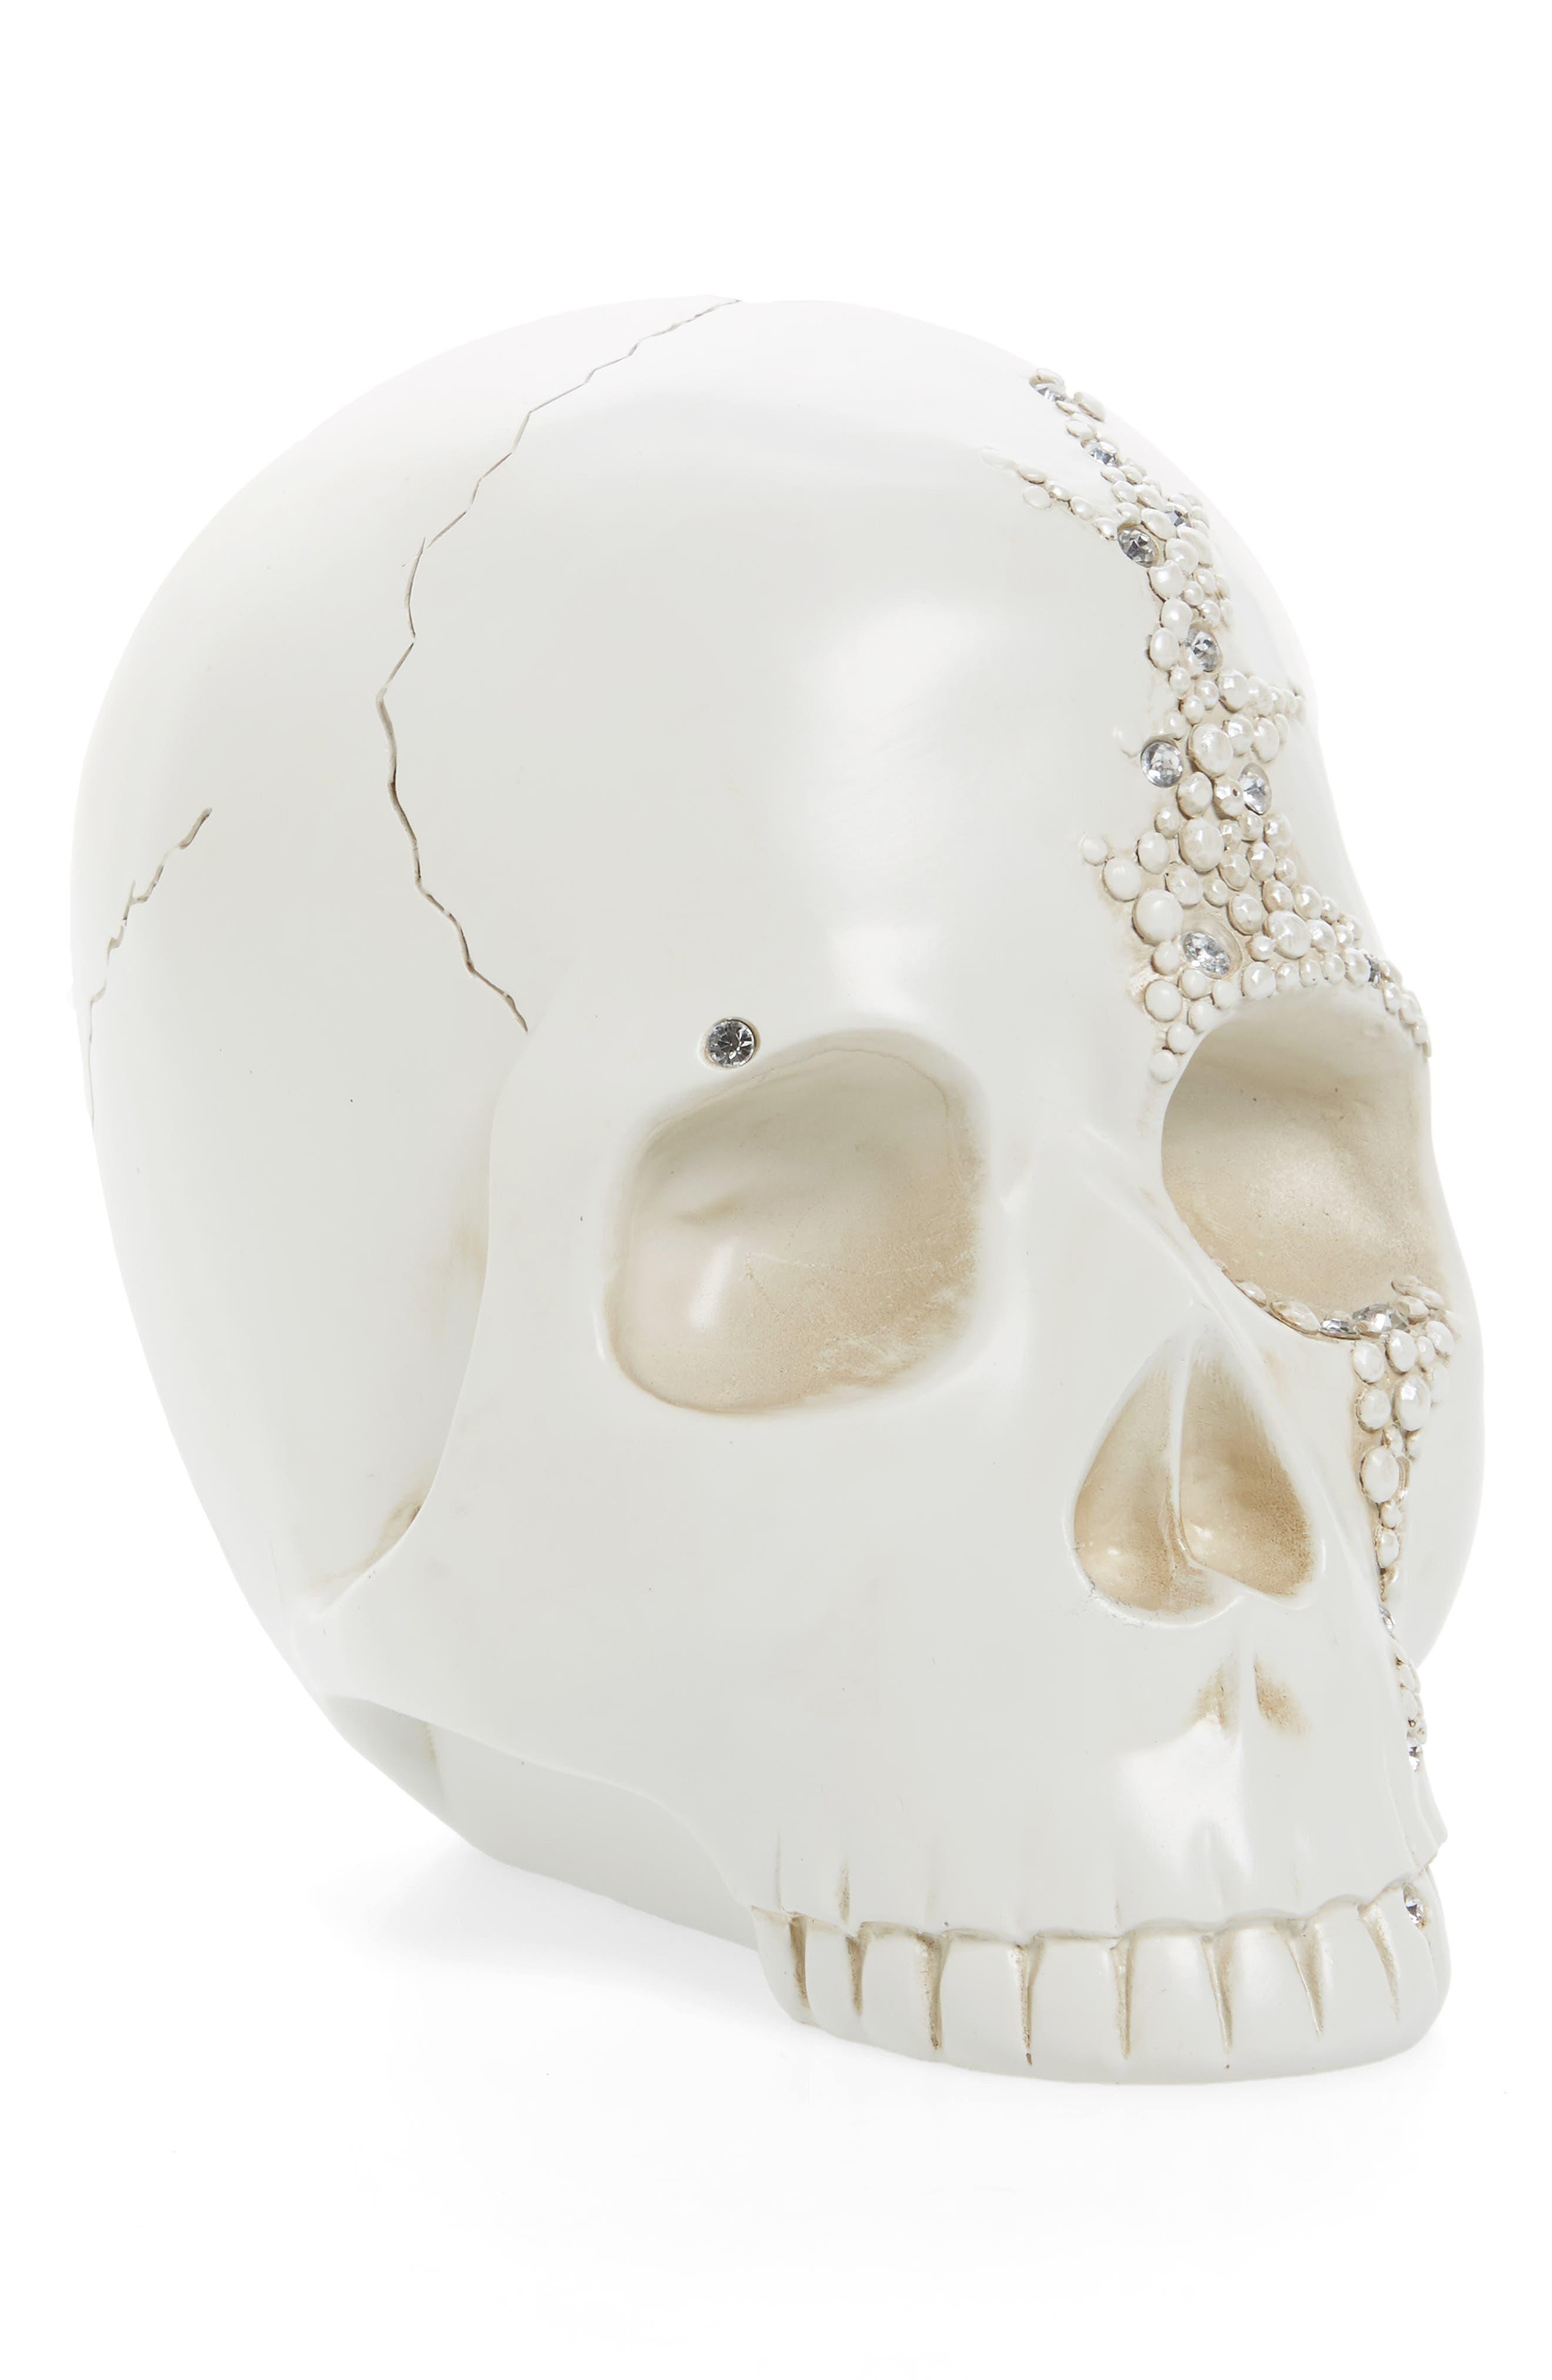 Silvertone Skull Decoration,                             Main thumbnail 1, color,                             Silver